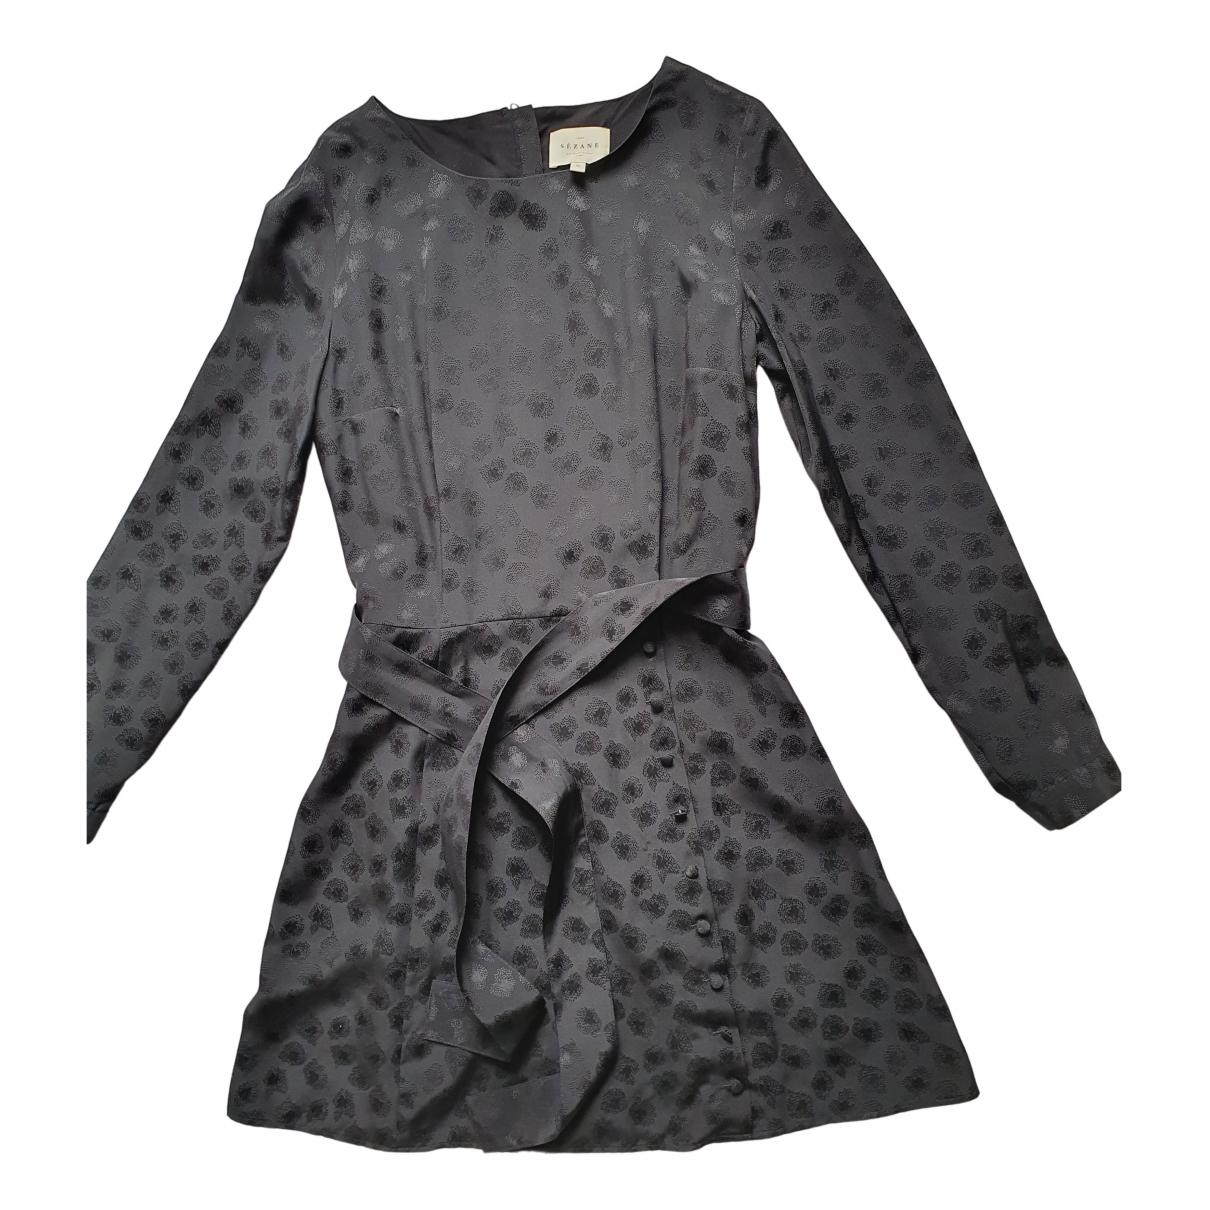 Sezane - Robe Fall Winter 2019 pour femme en soie - noir